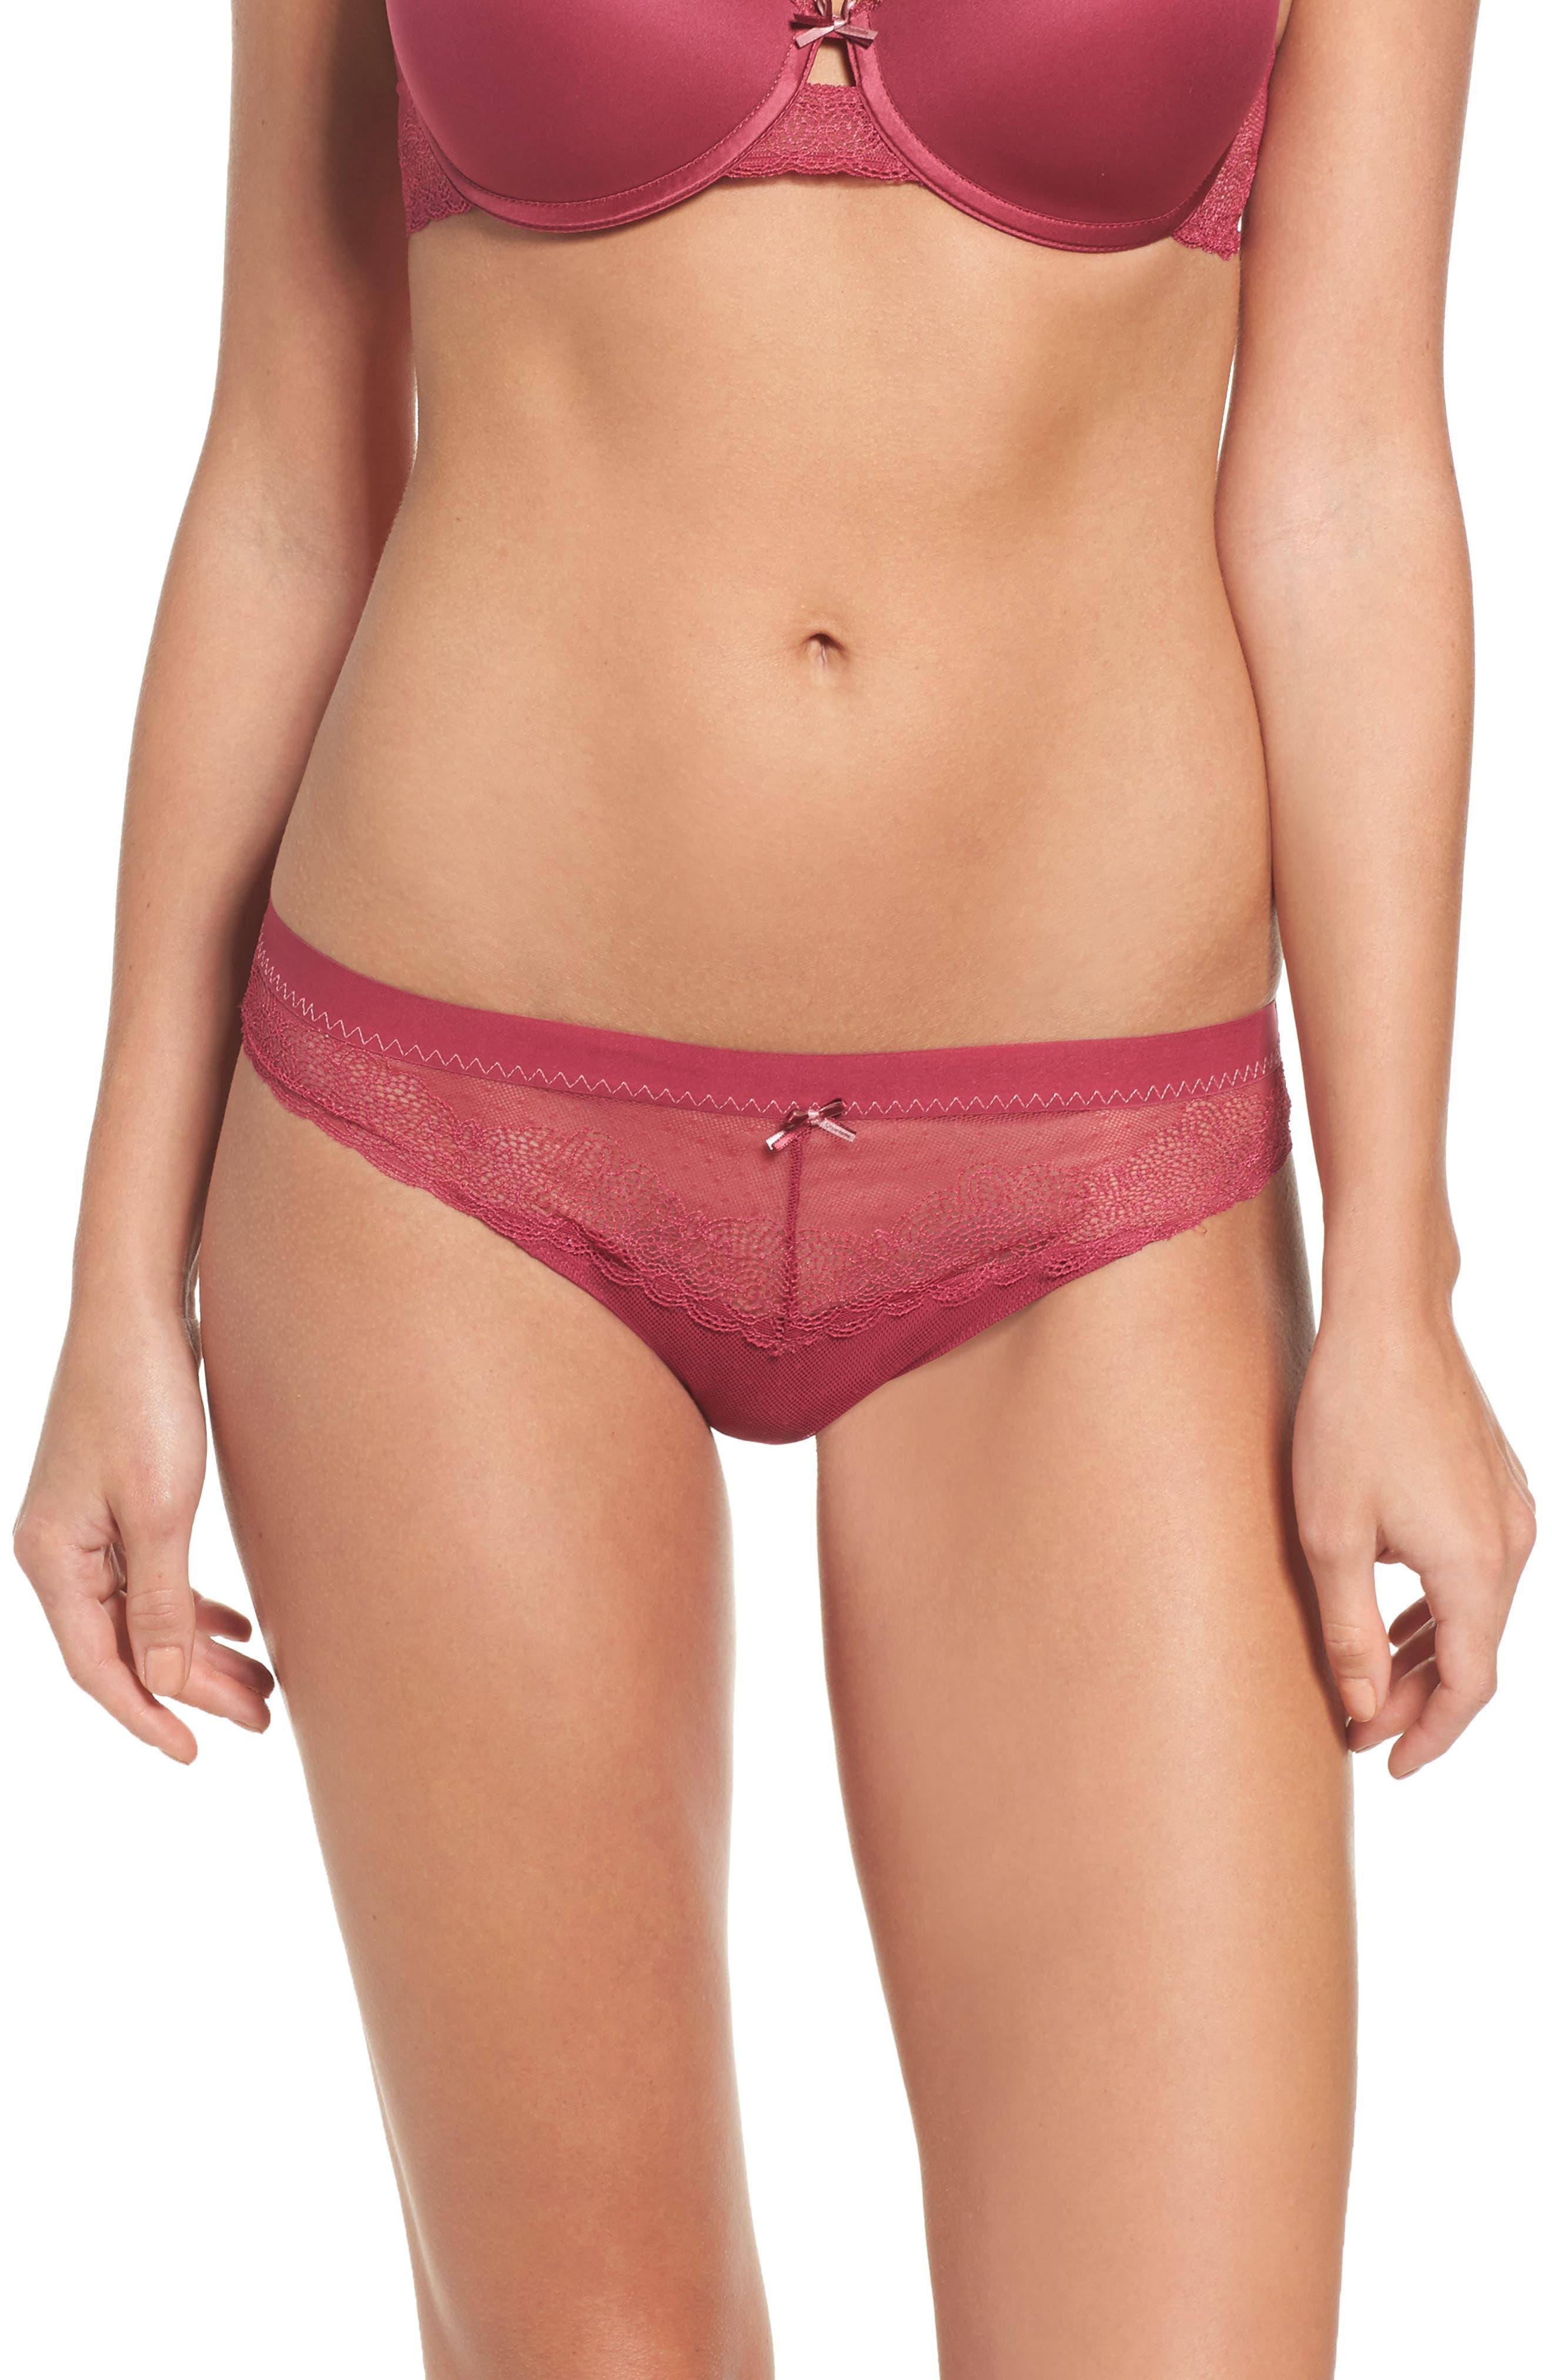 Main Image - Chantelle Intimates Le Marais Lace Cheeky Bikini